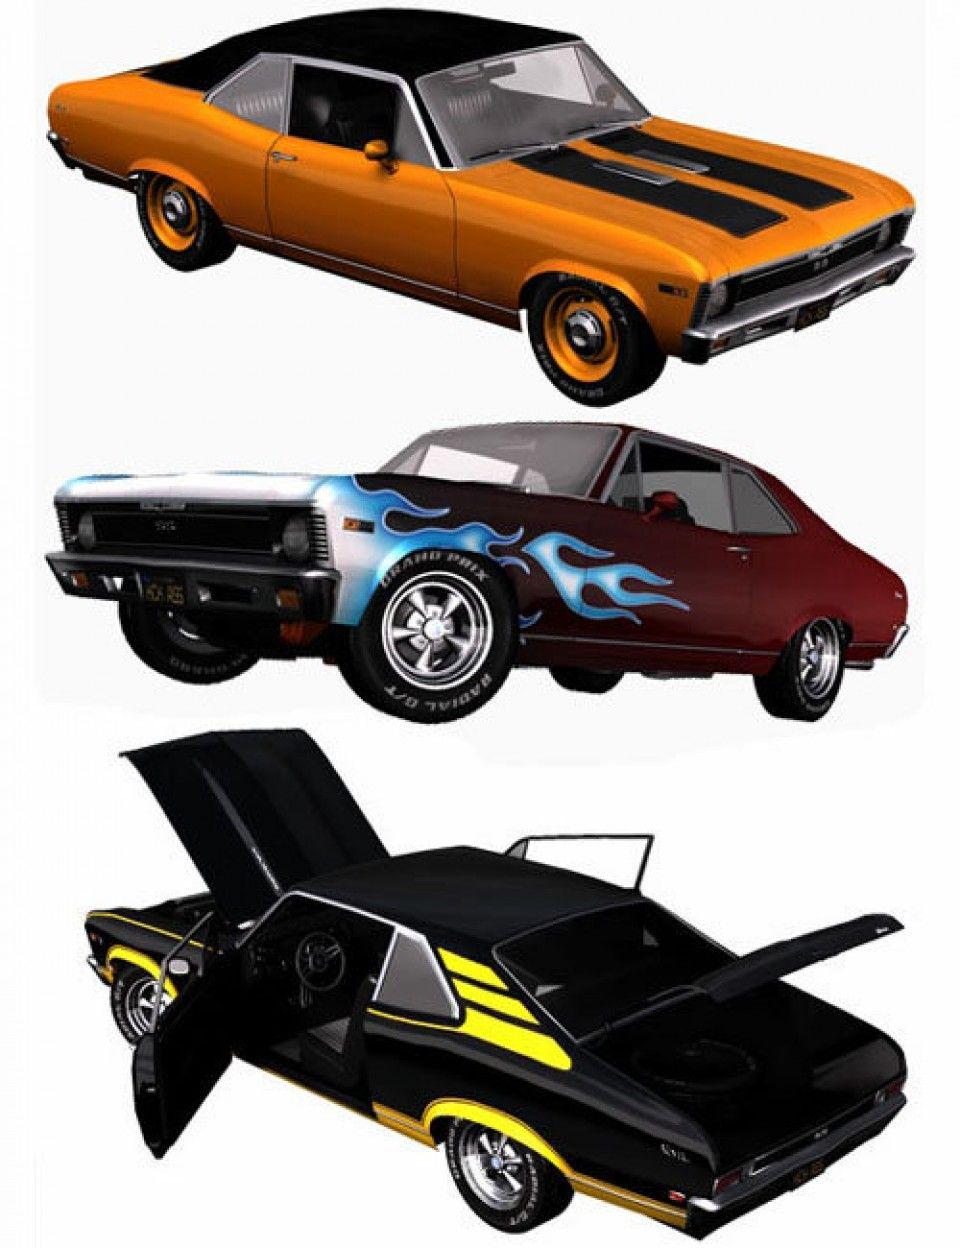 1968 AM Muscle Car | Daz3D Vehicles | Pinterest | Muscles